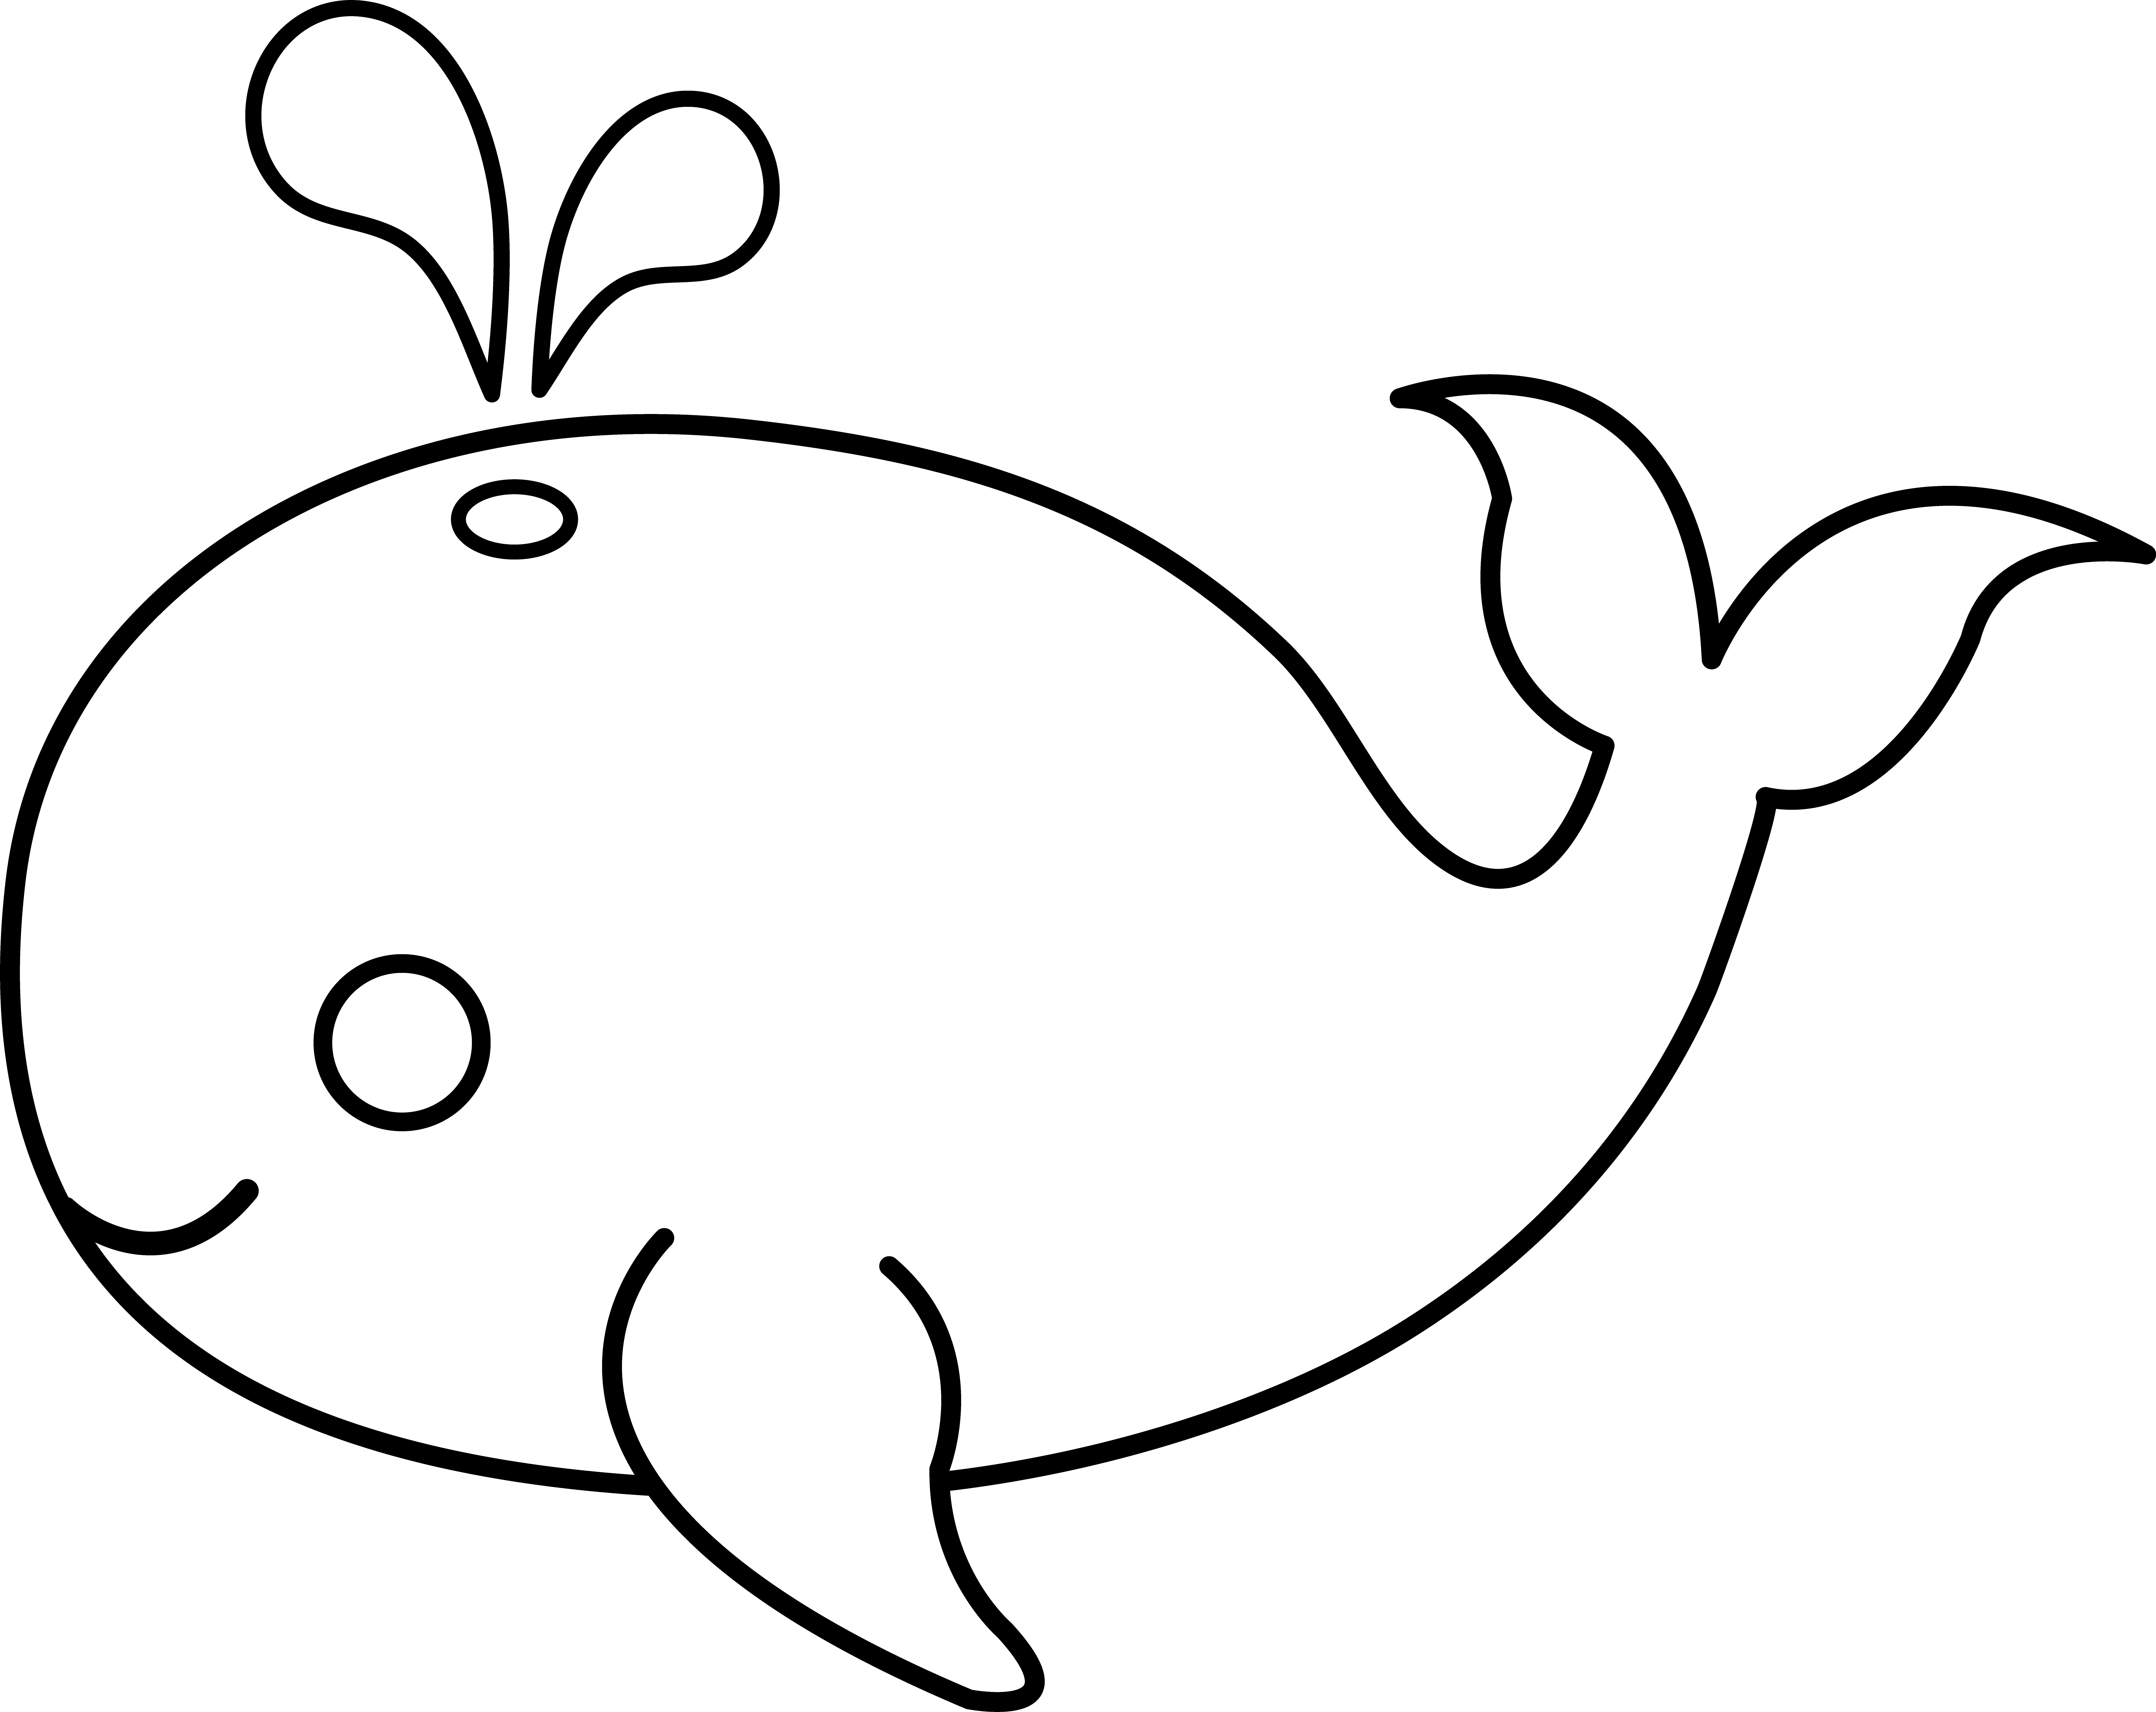 7203x5719 Killer Whale Outline